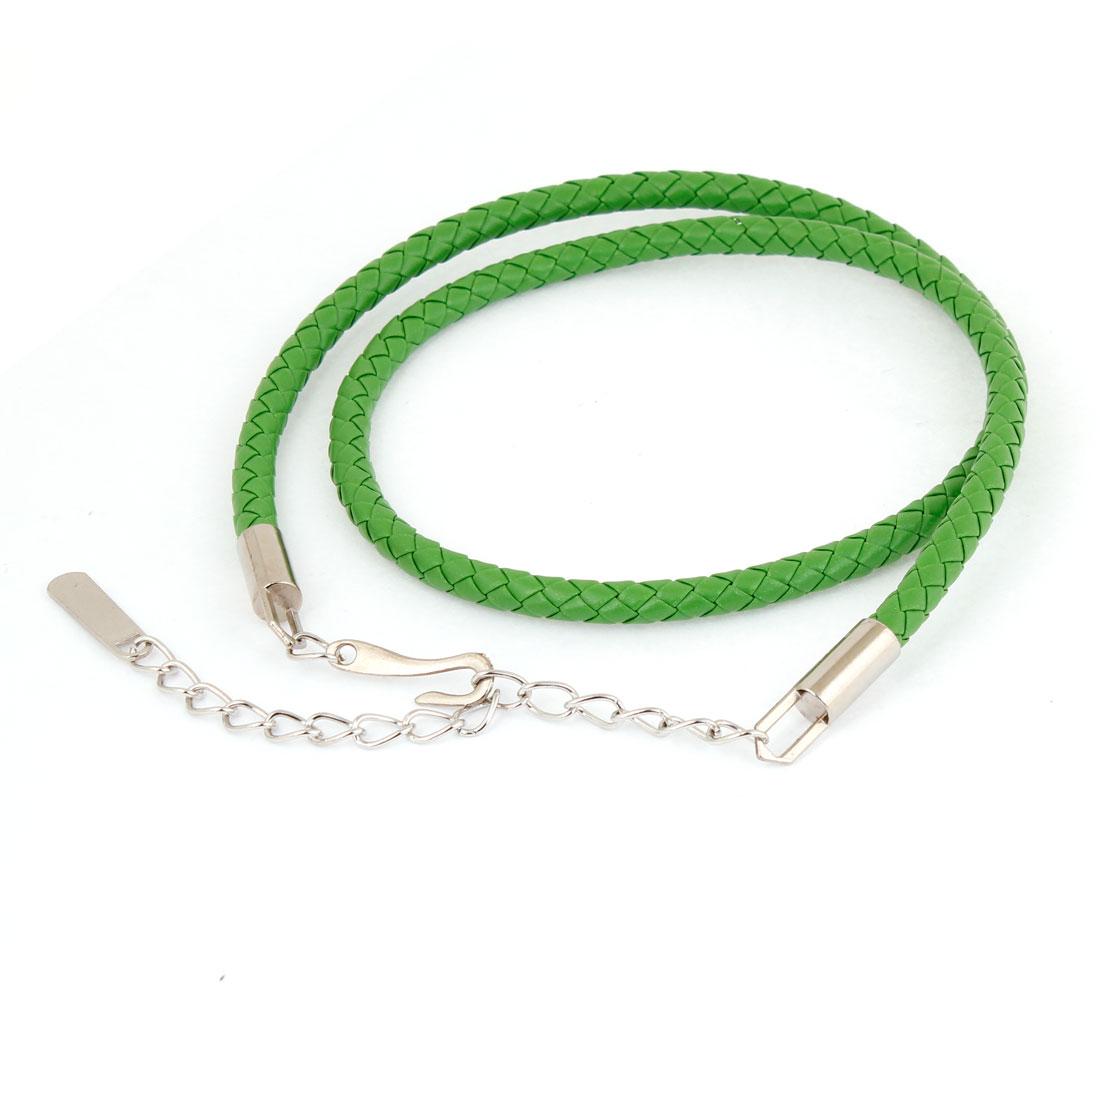 Ladies Hook Buckle Faux Leather Round Braided Waist Belt Chain Green